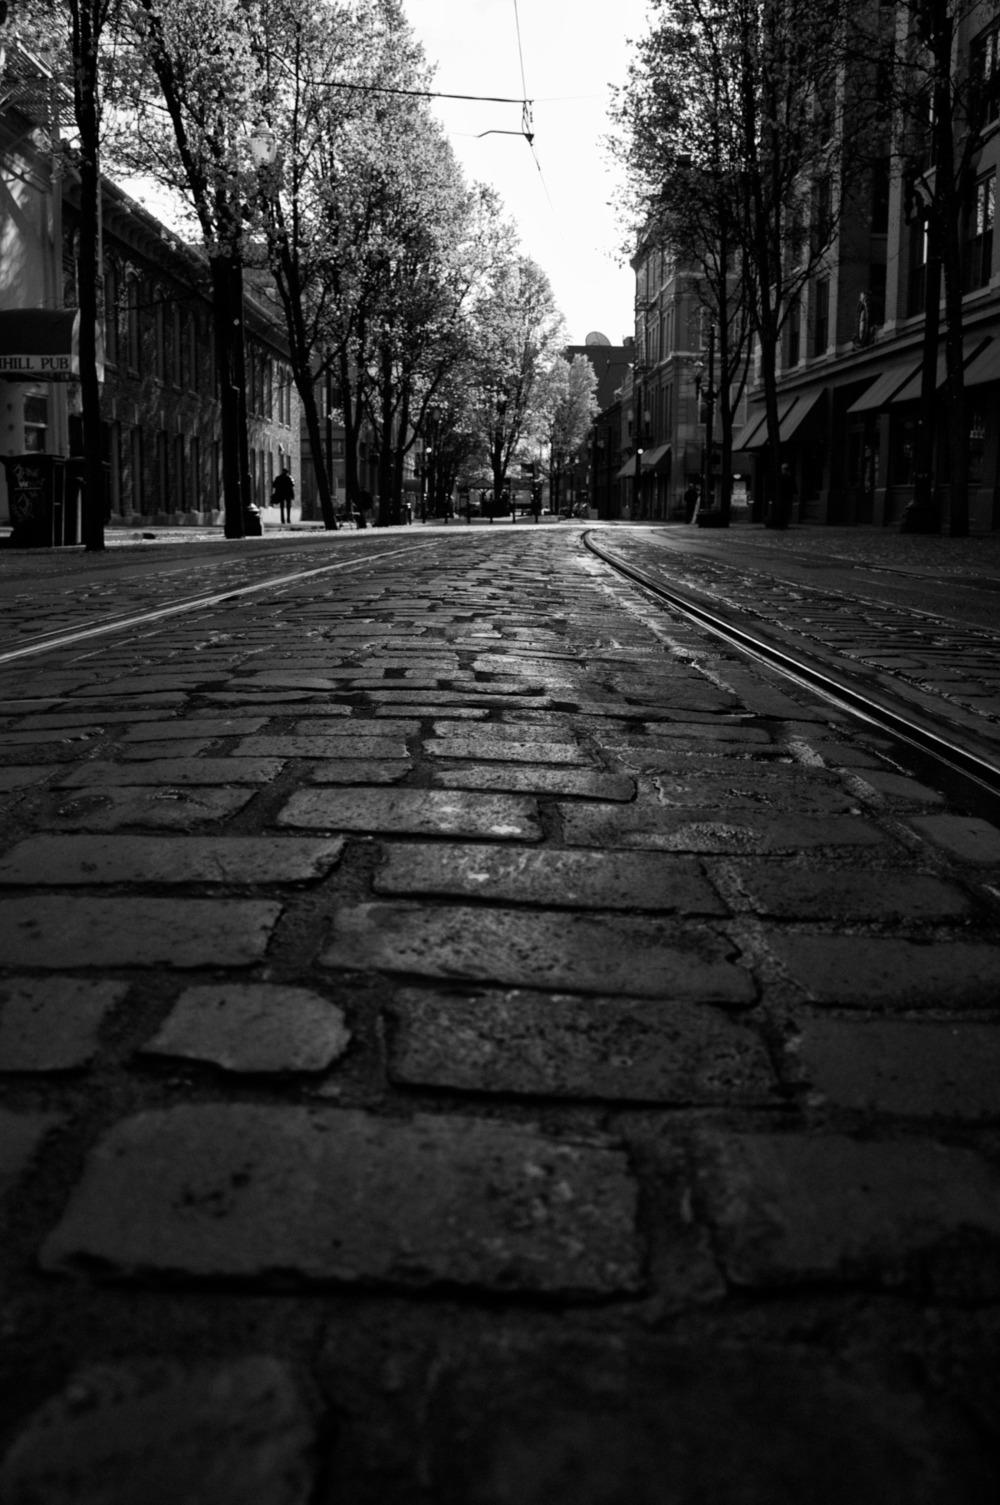 2010-03-10 at 10-37-11 street, cobblestones, tracks, train, black & white, city, urban, portland.jpg